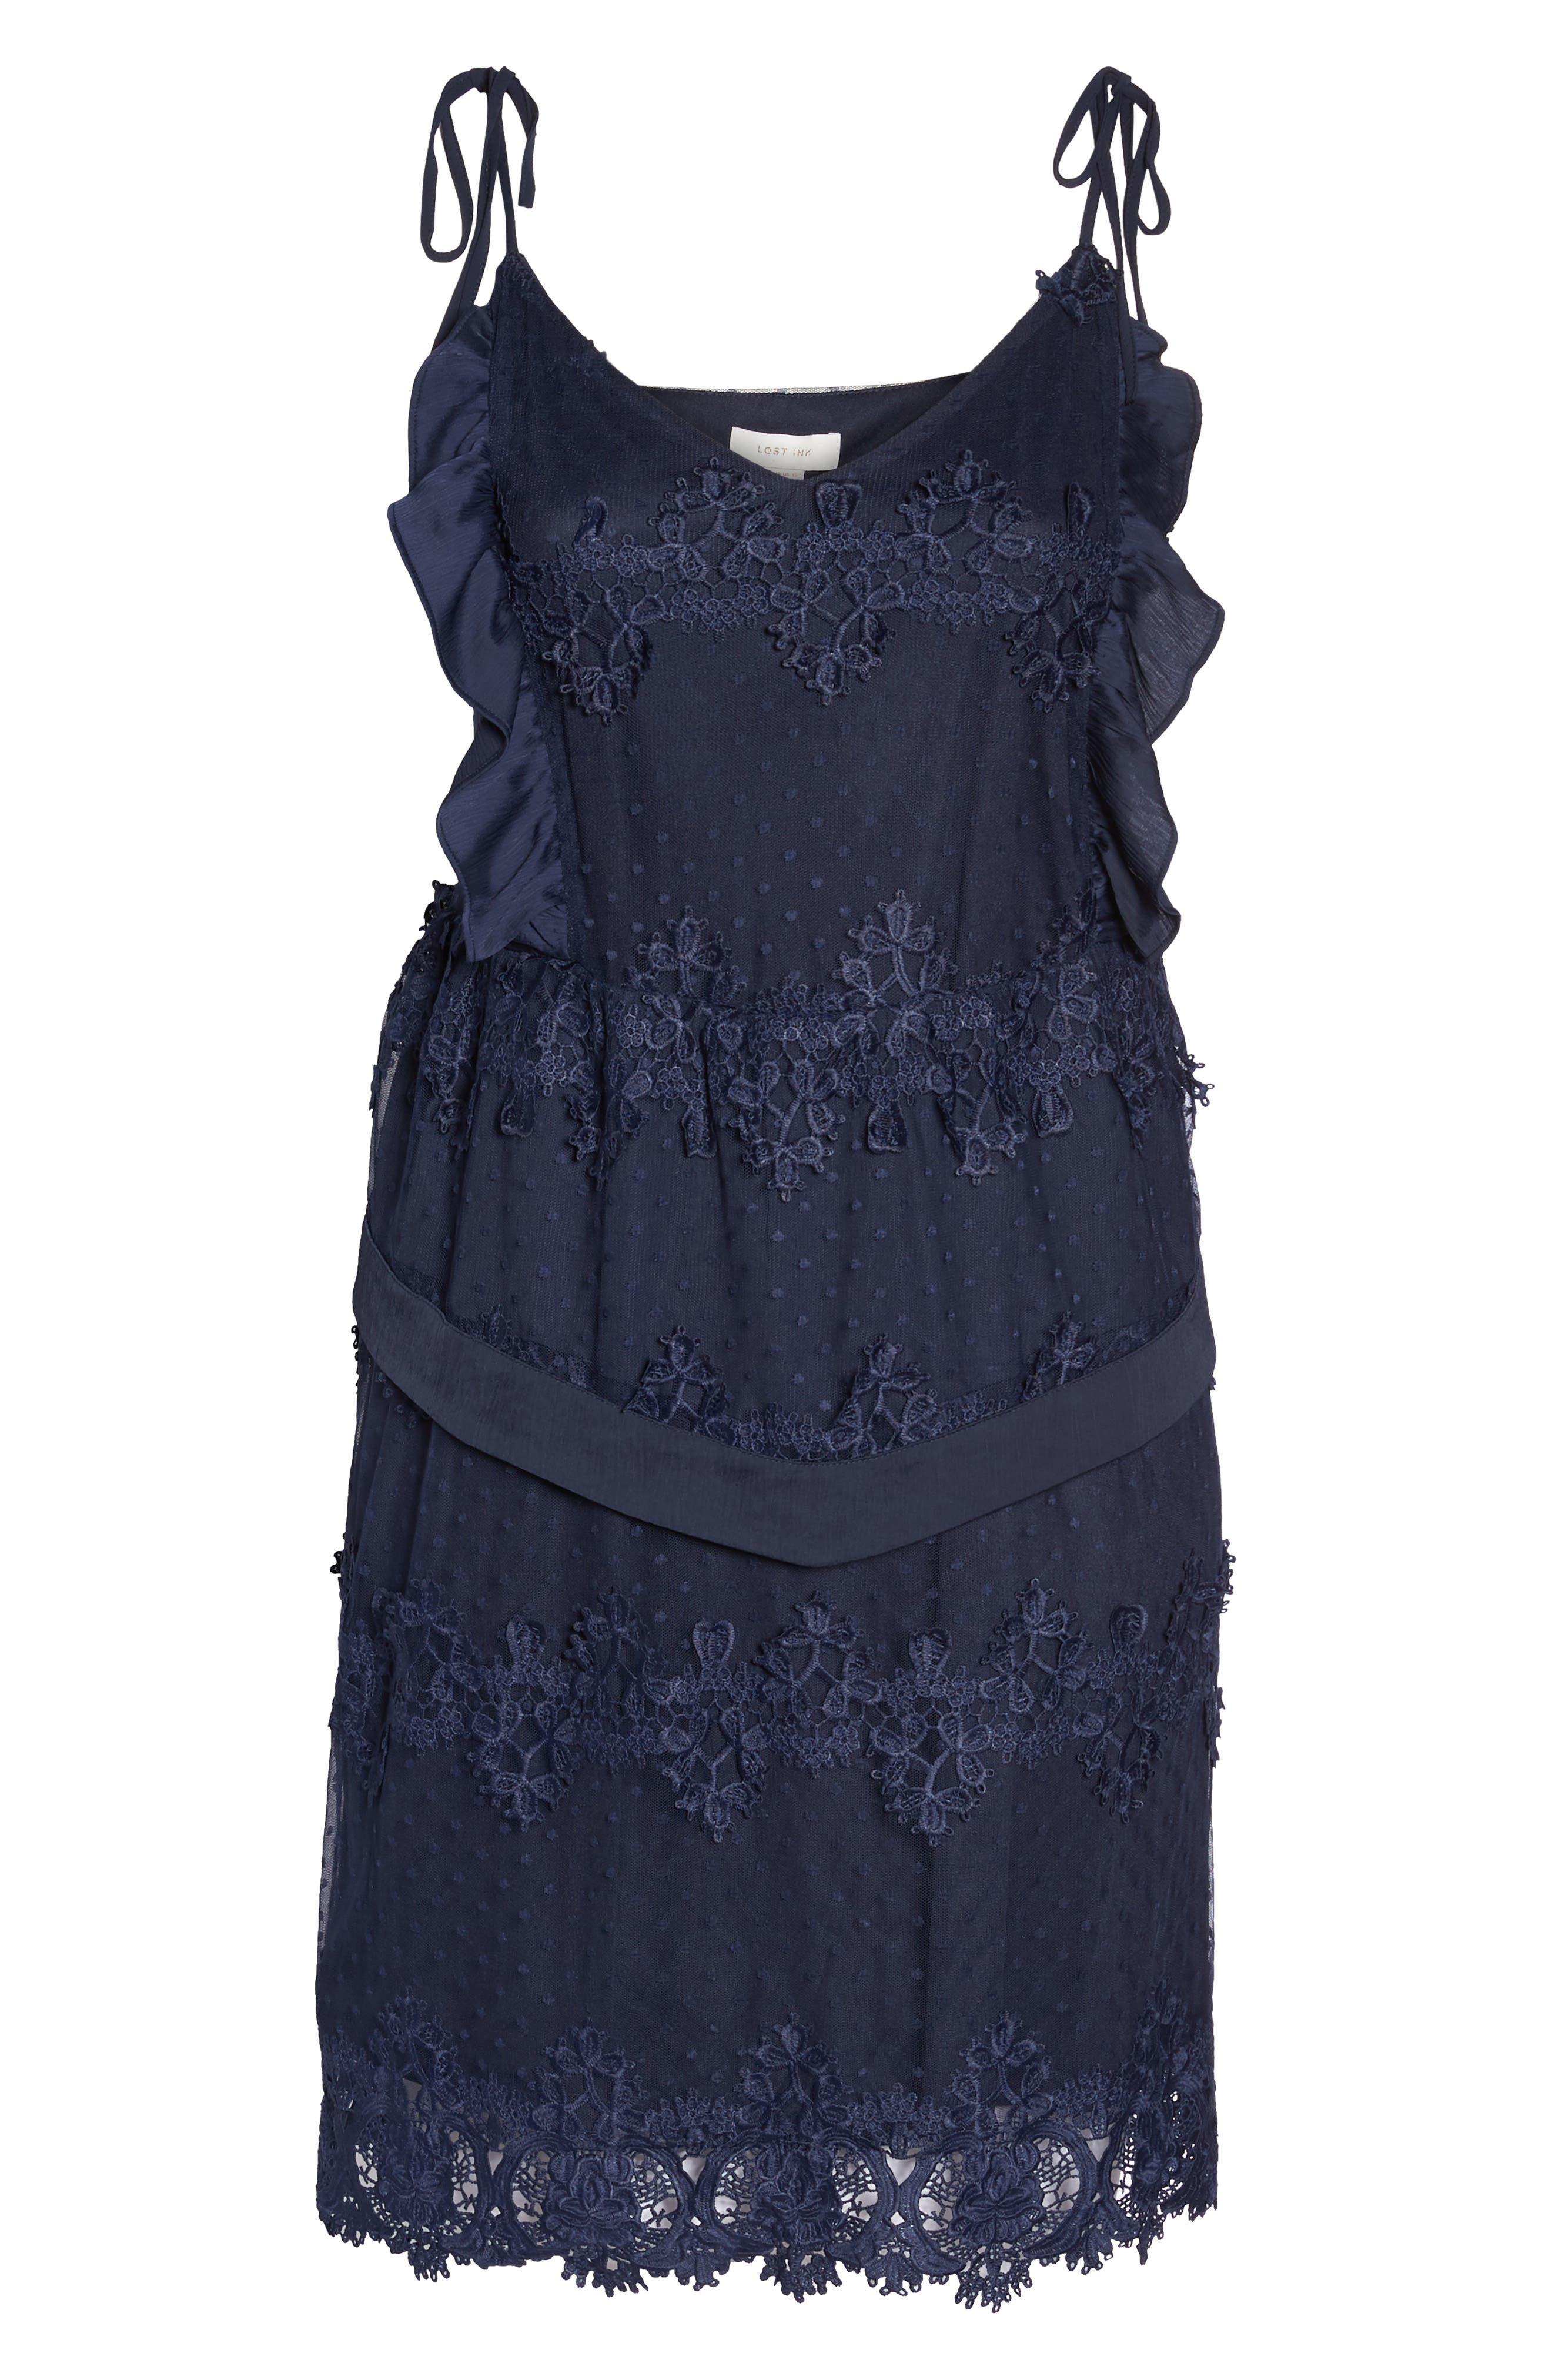 Lace Swiss Dot Swing Dress,                             Alternate thumbnail 7, color,                             Navy